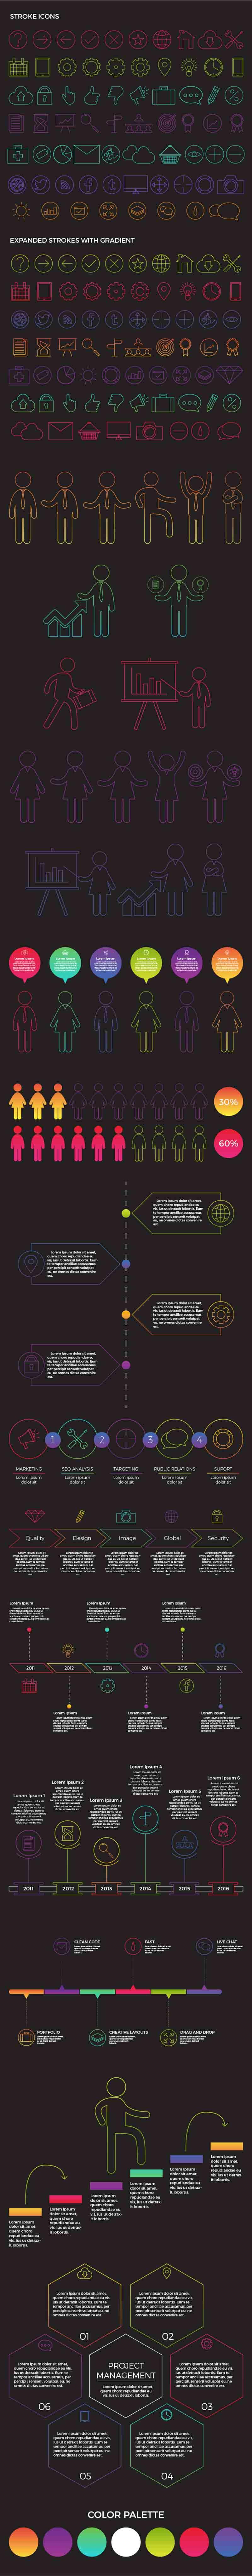 Business-Infographic-Elements-Set-2-01